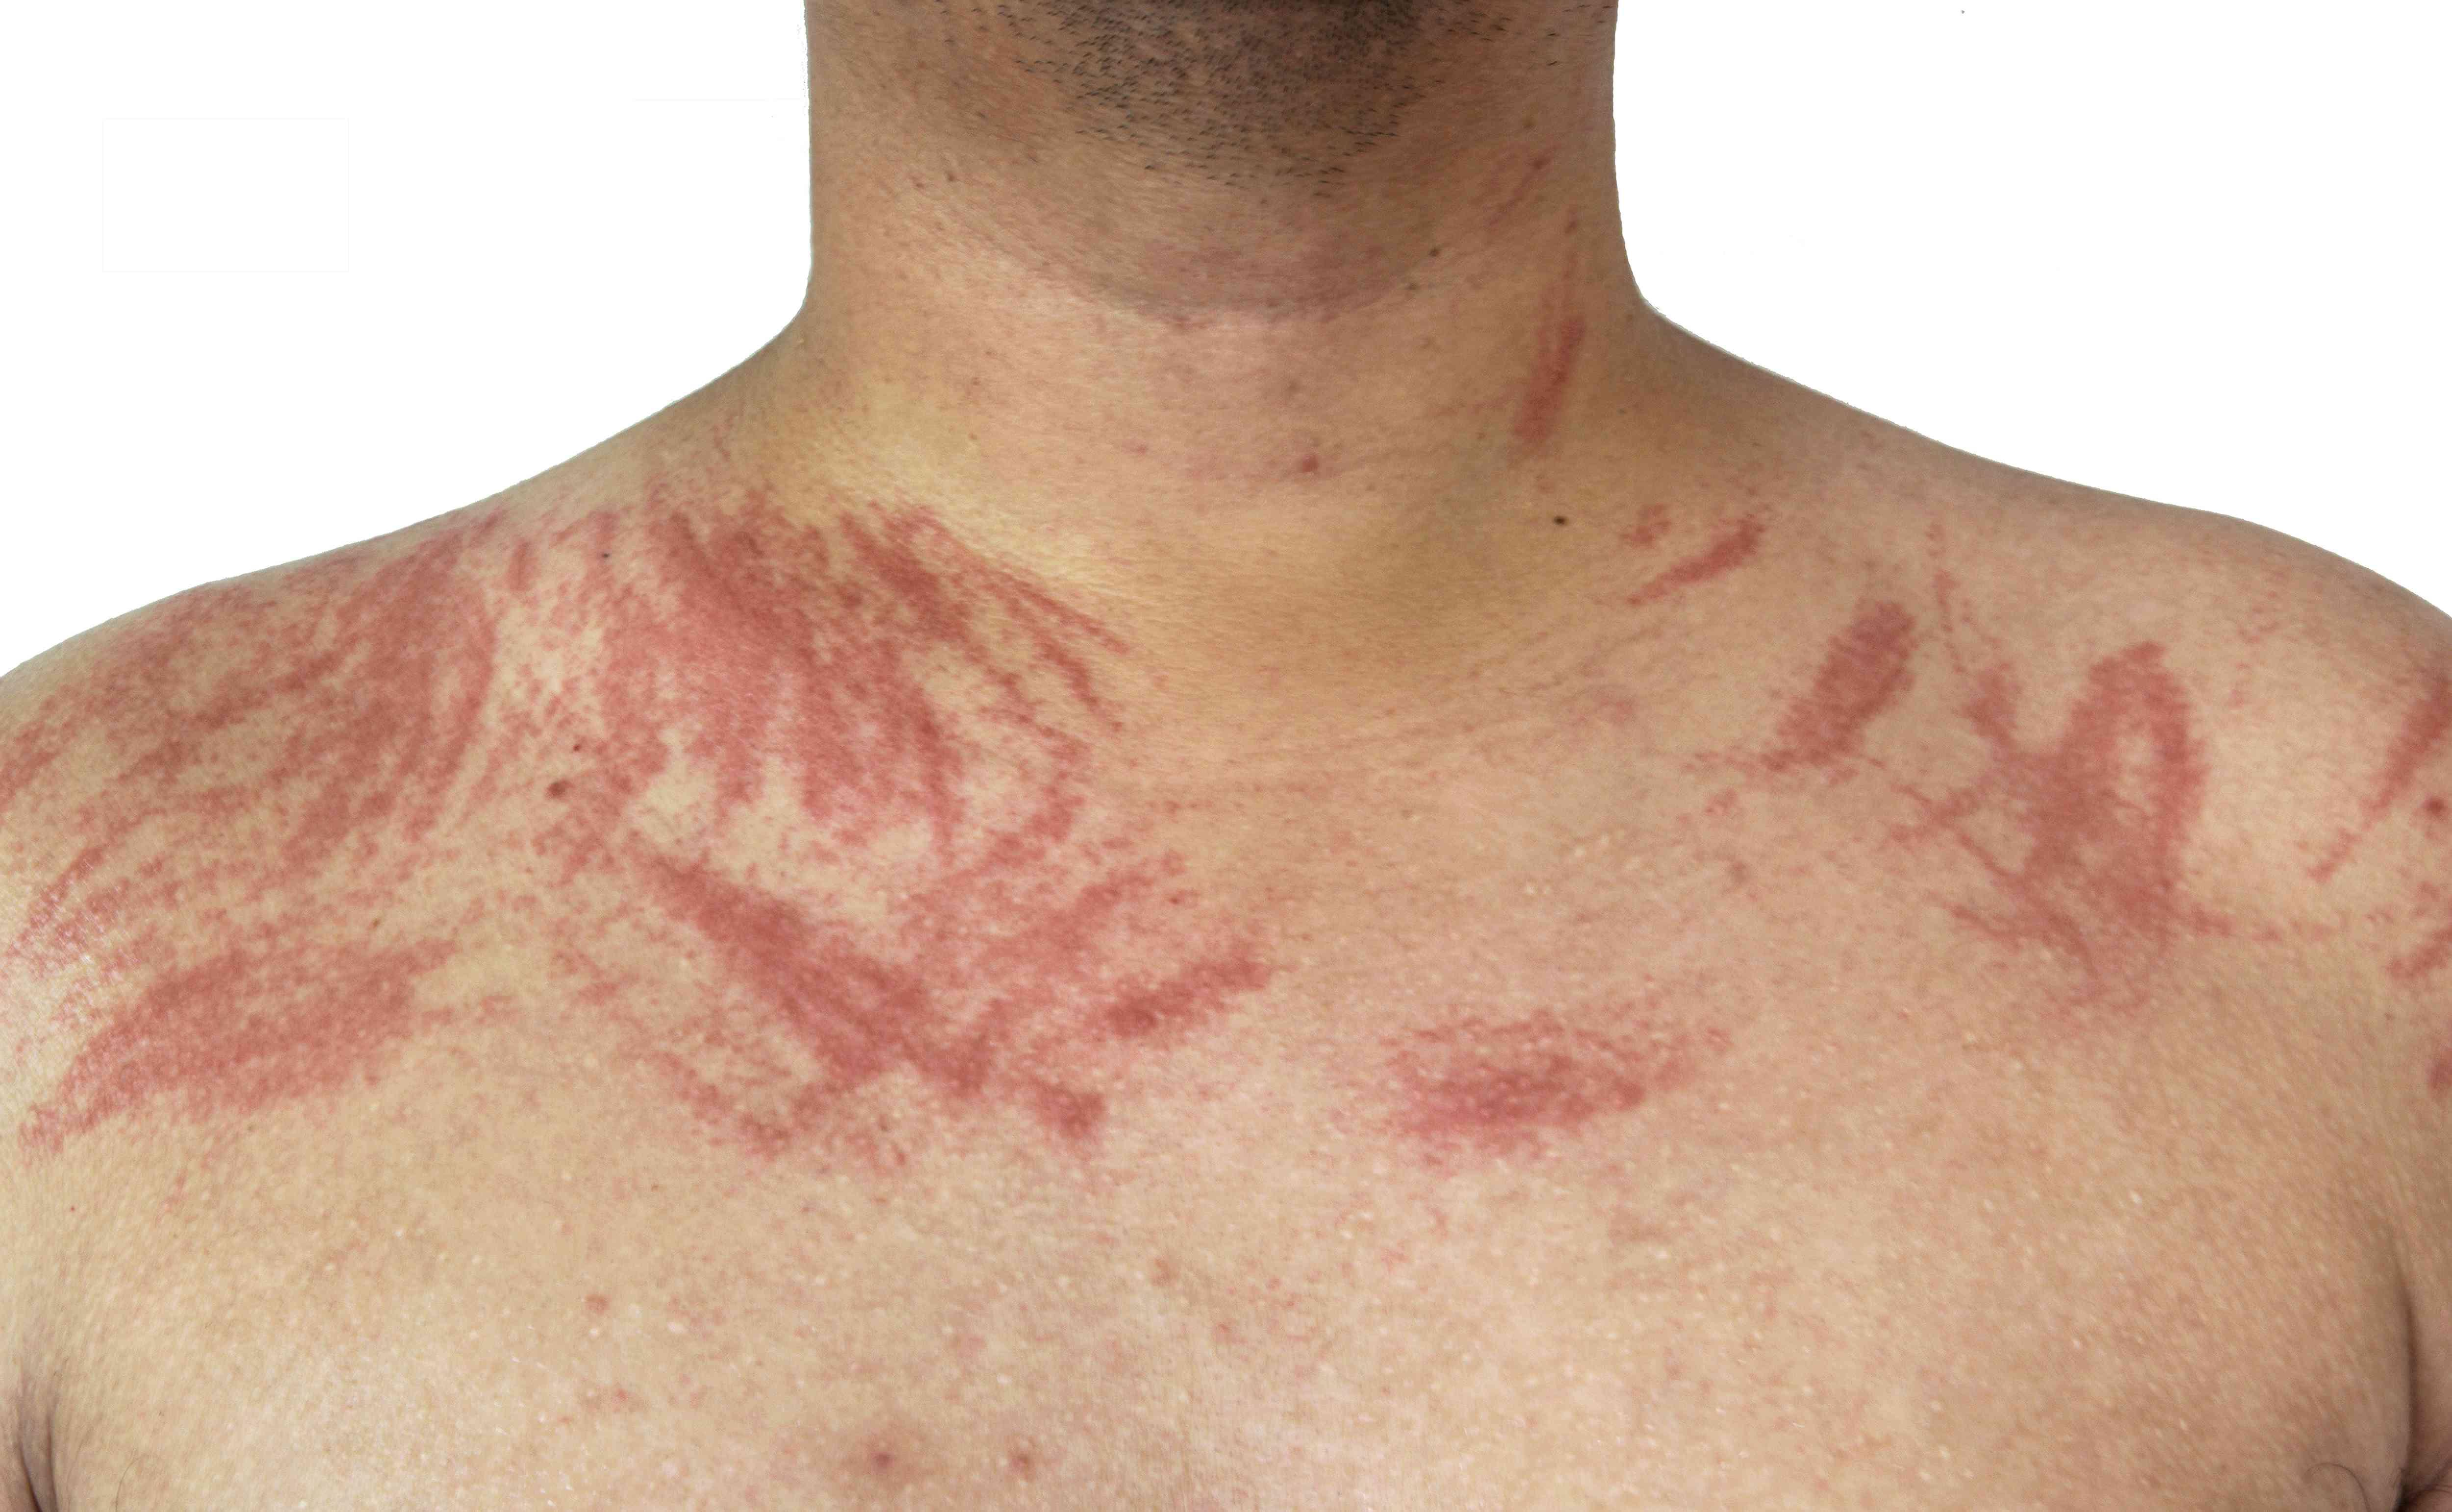 Dermatographia allergy on skin